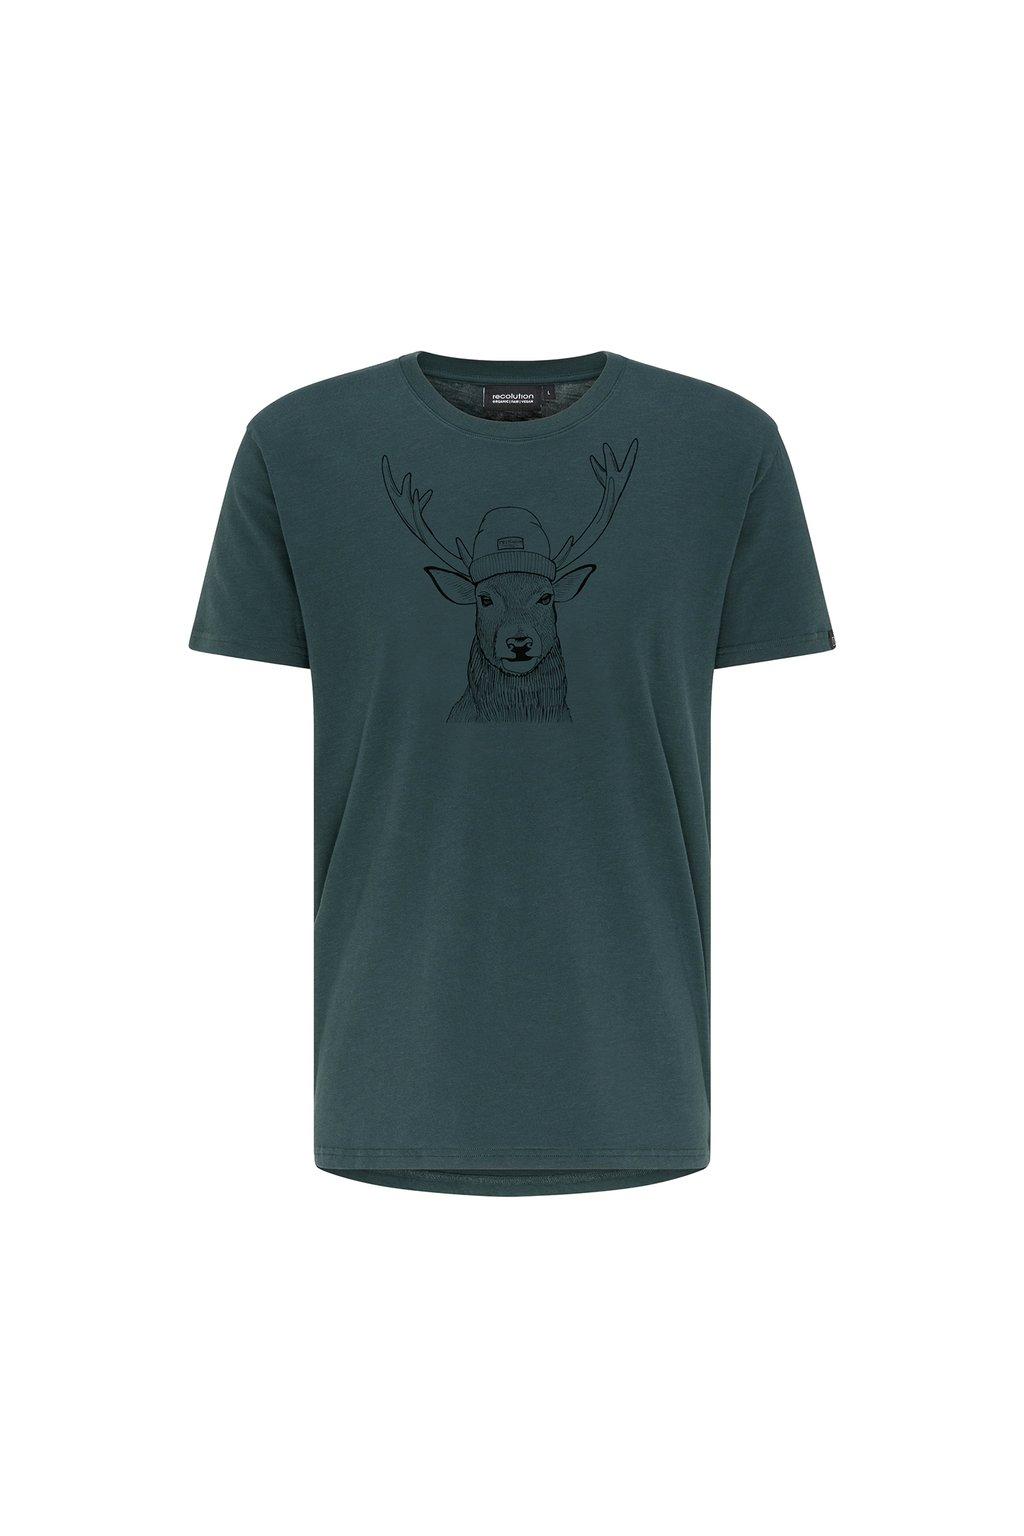 "Pánske zelené tričko ""DEER eucalyptus"""